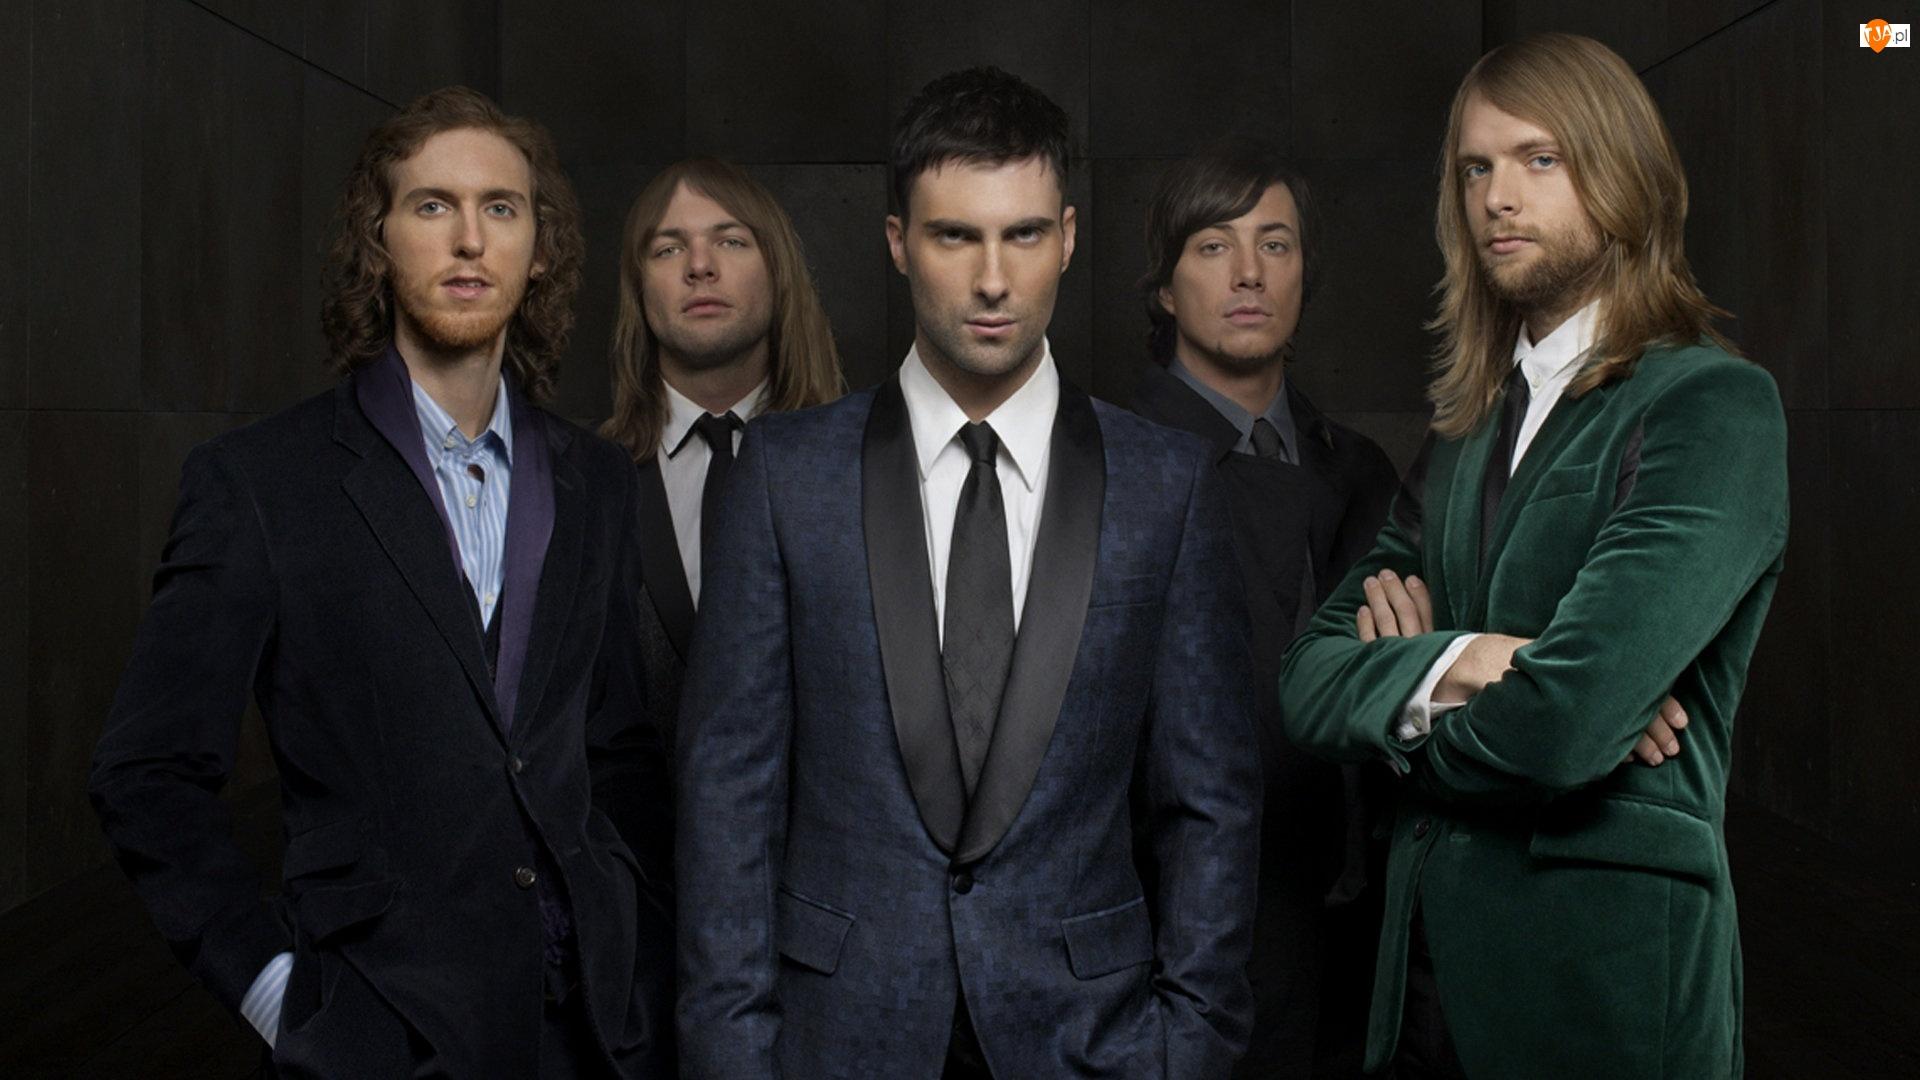 Zespół, Maroon 5